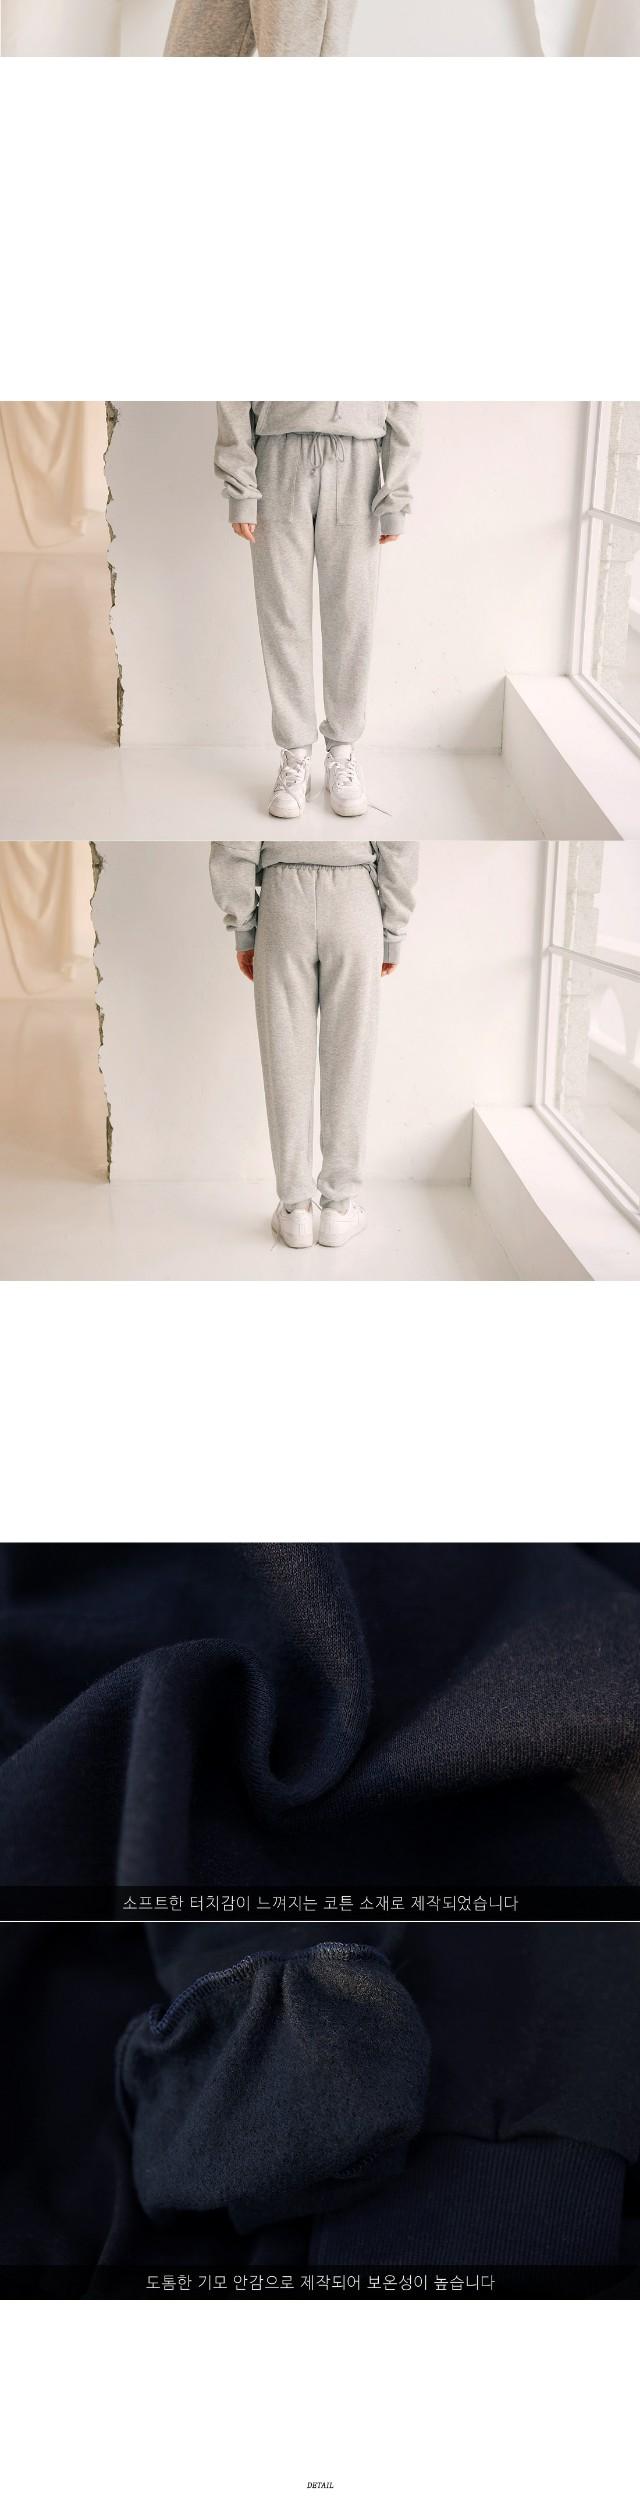 [BOTTOM] NAPPING TRAINING SET PANTS